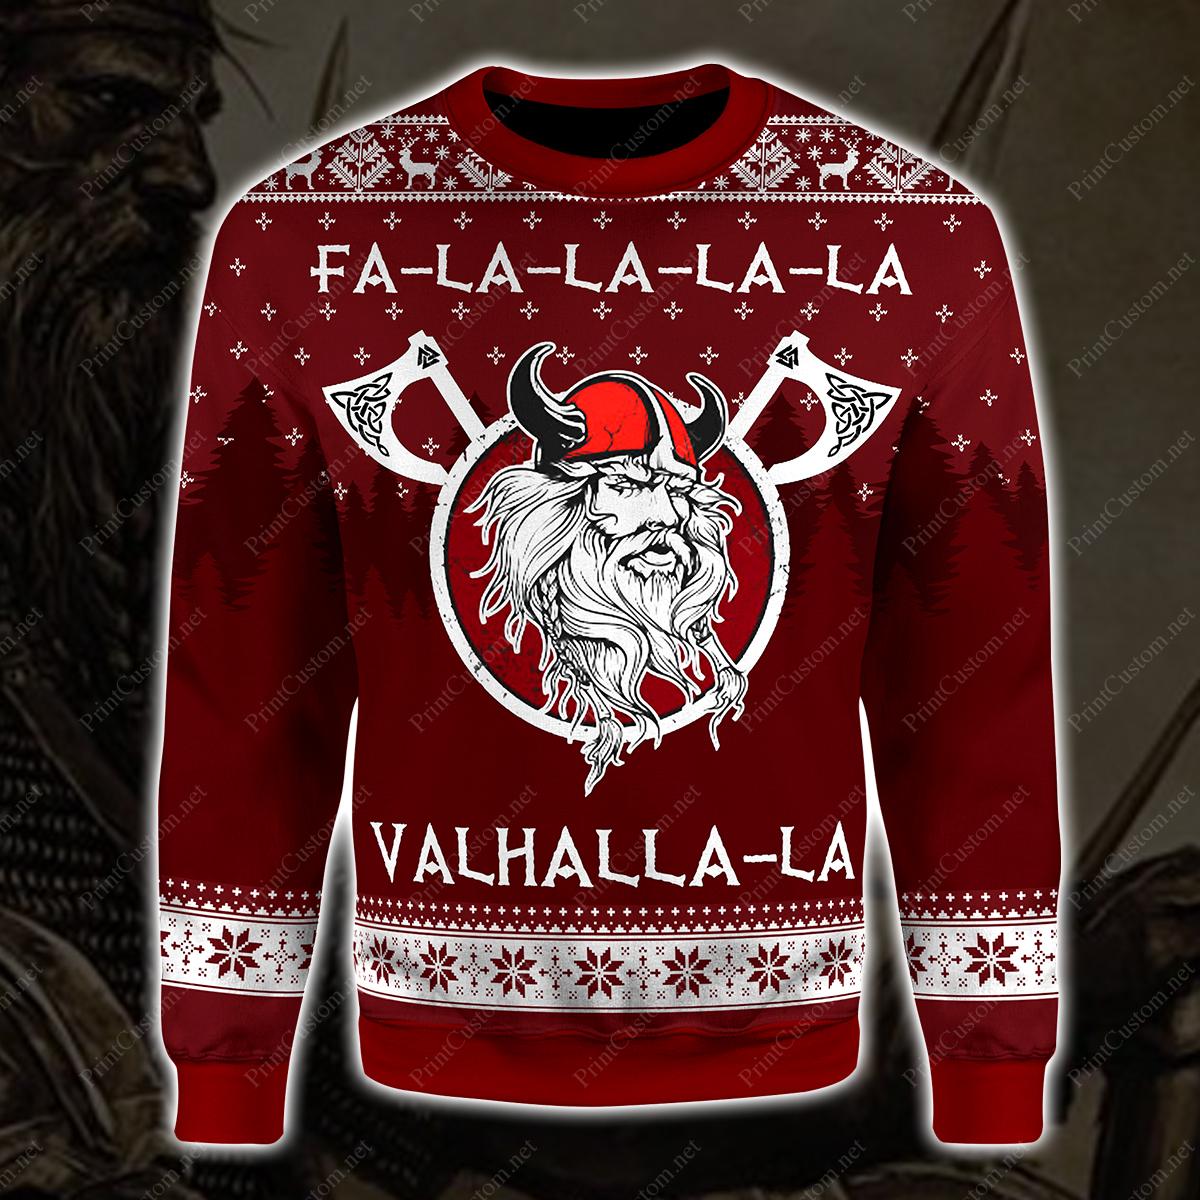 Fa-la-la-la-la valhalla-la viking ugly christmas sweater 2